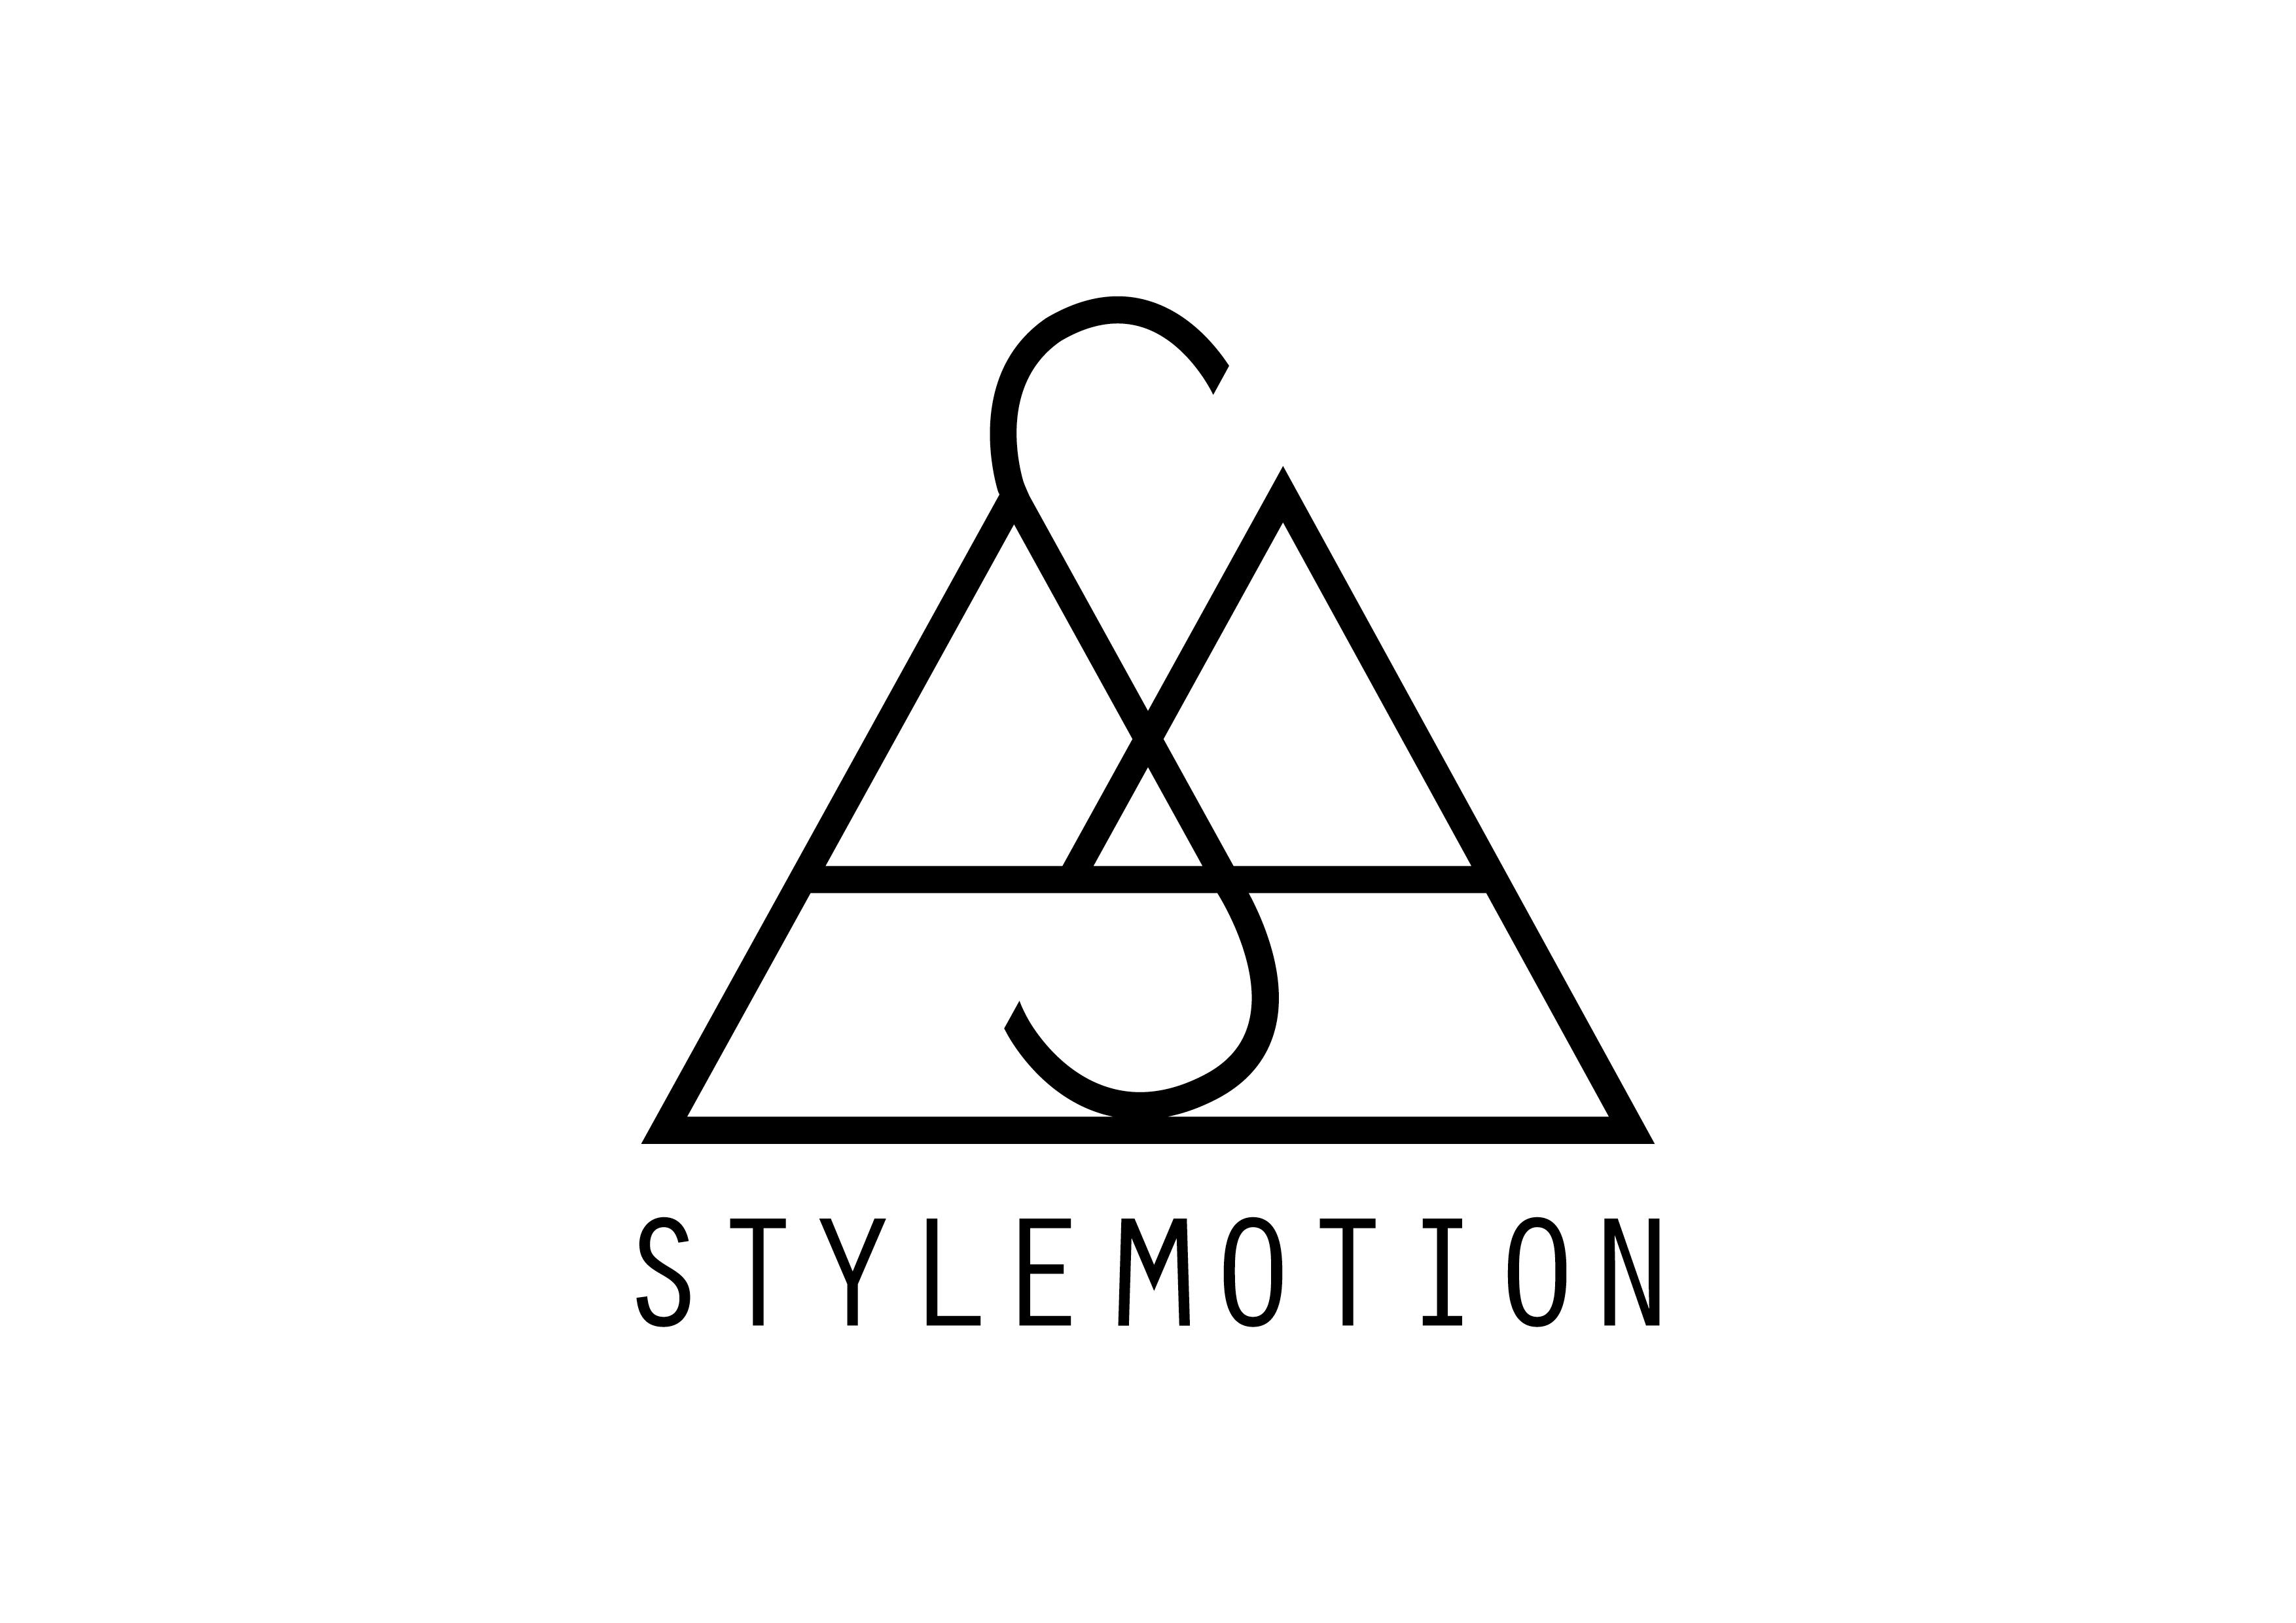 StyleMotion3